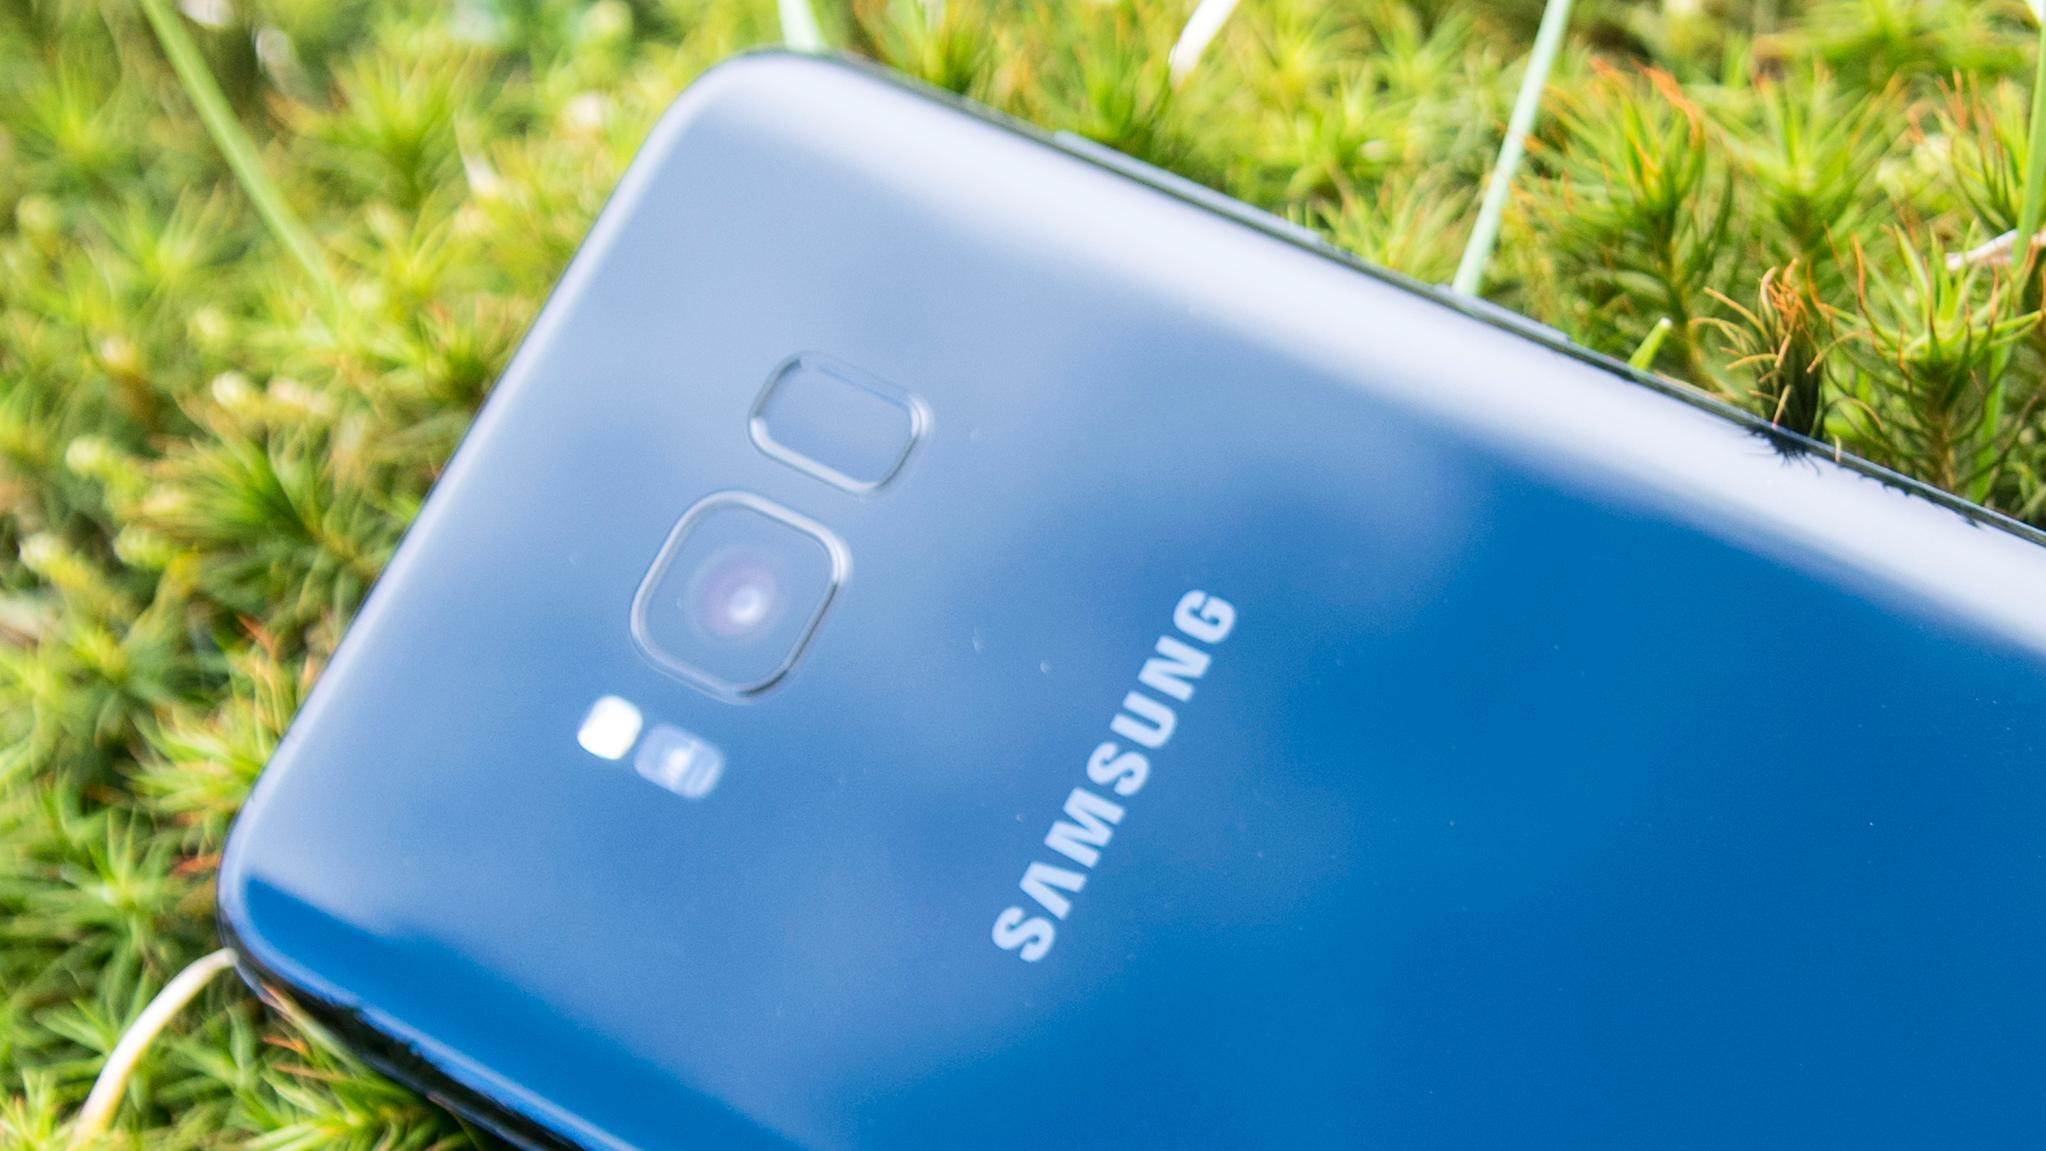 Rykteoppsummering: Samsung Galaxy S9